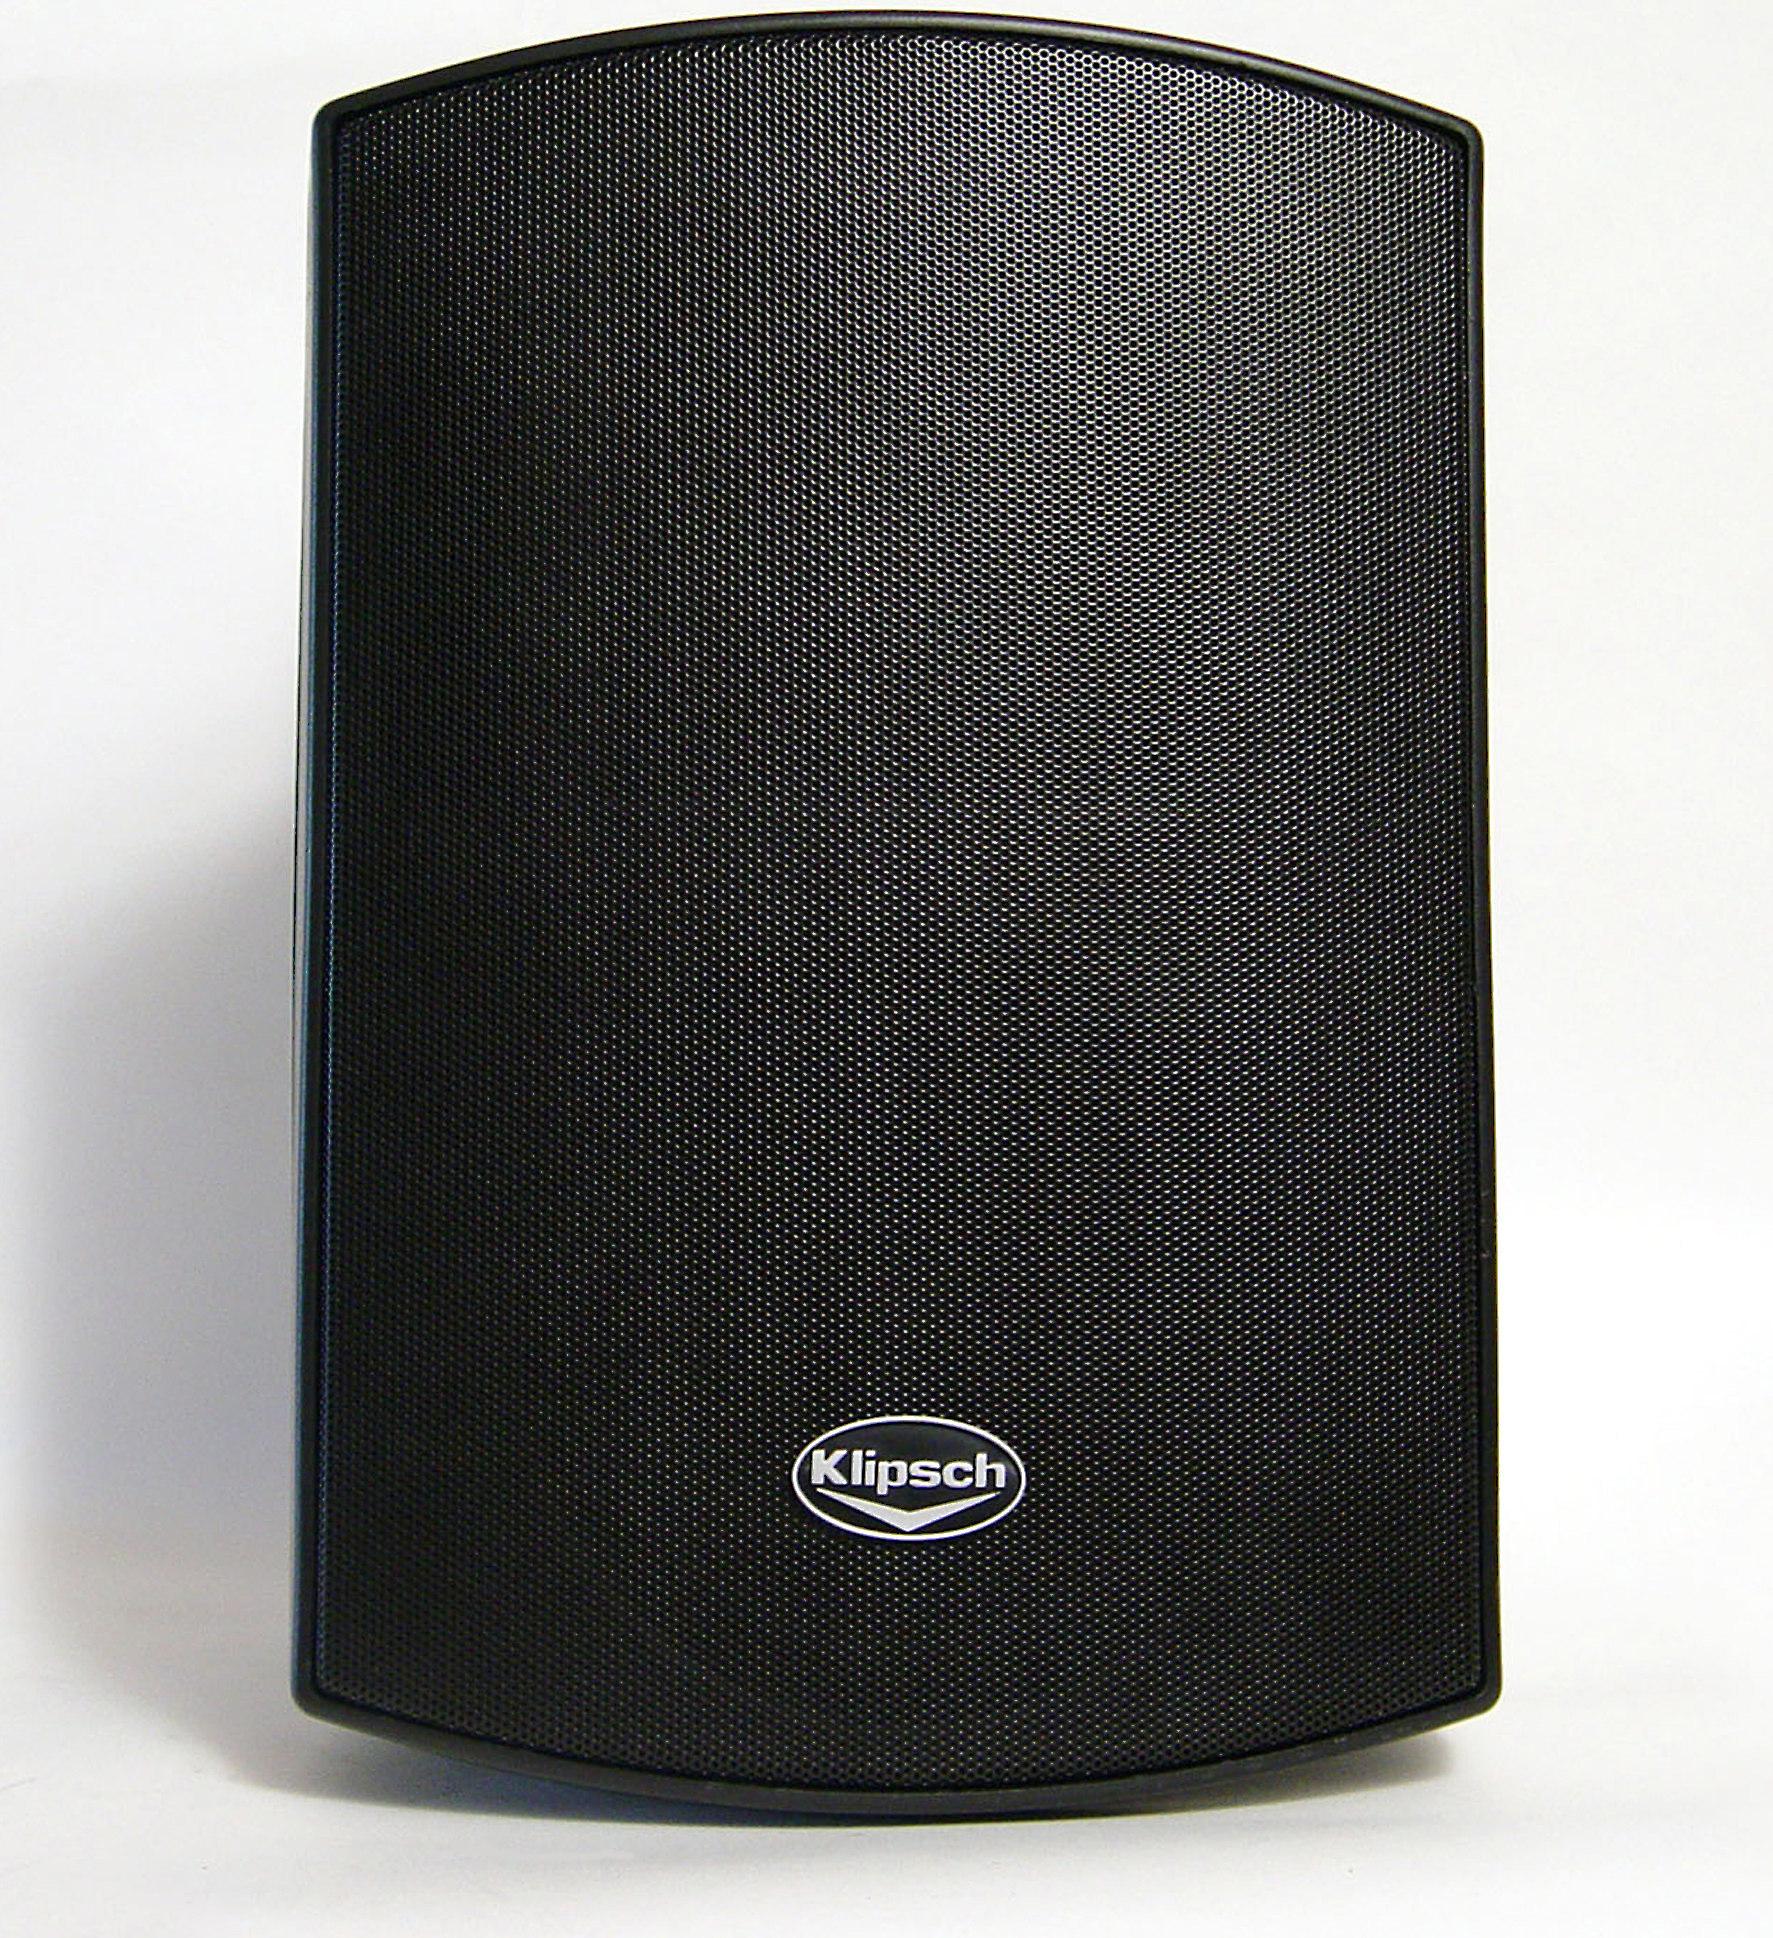 b3e7aa0b2f3 Klipsch AW-525 (Black) Outdoor speakers at Crutchfield